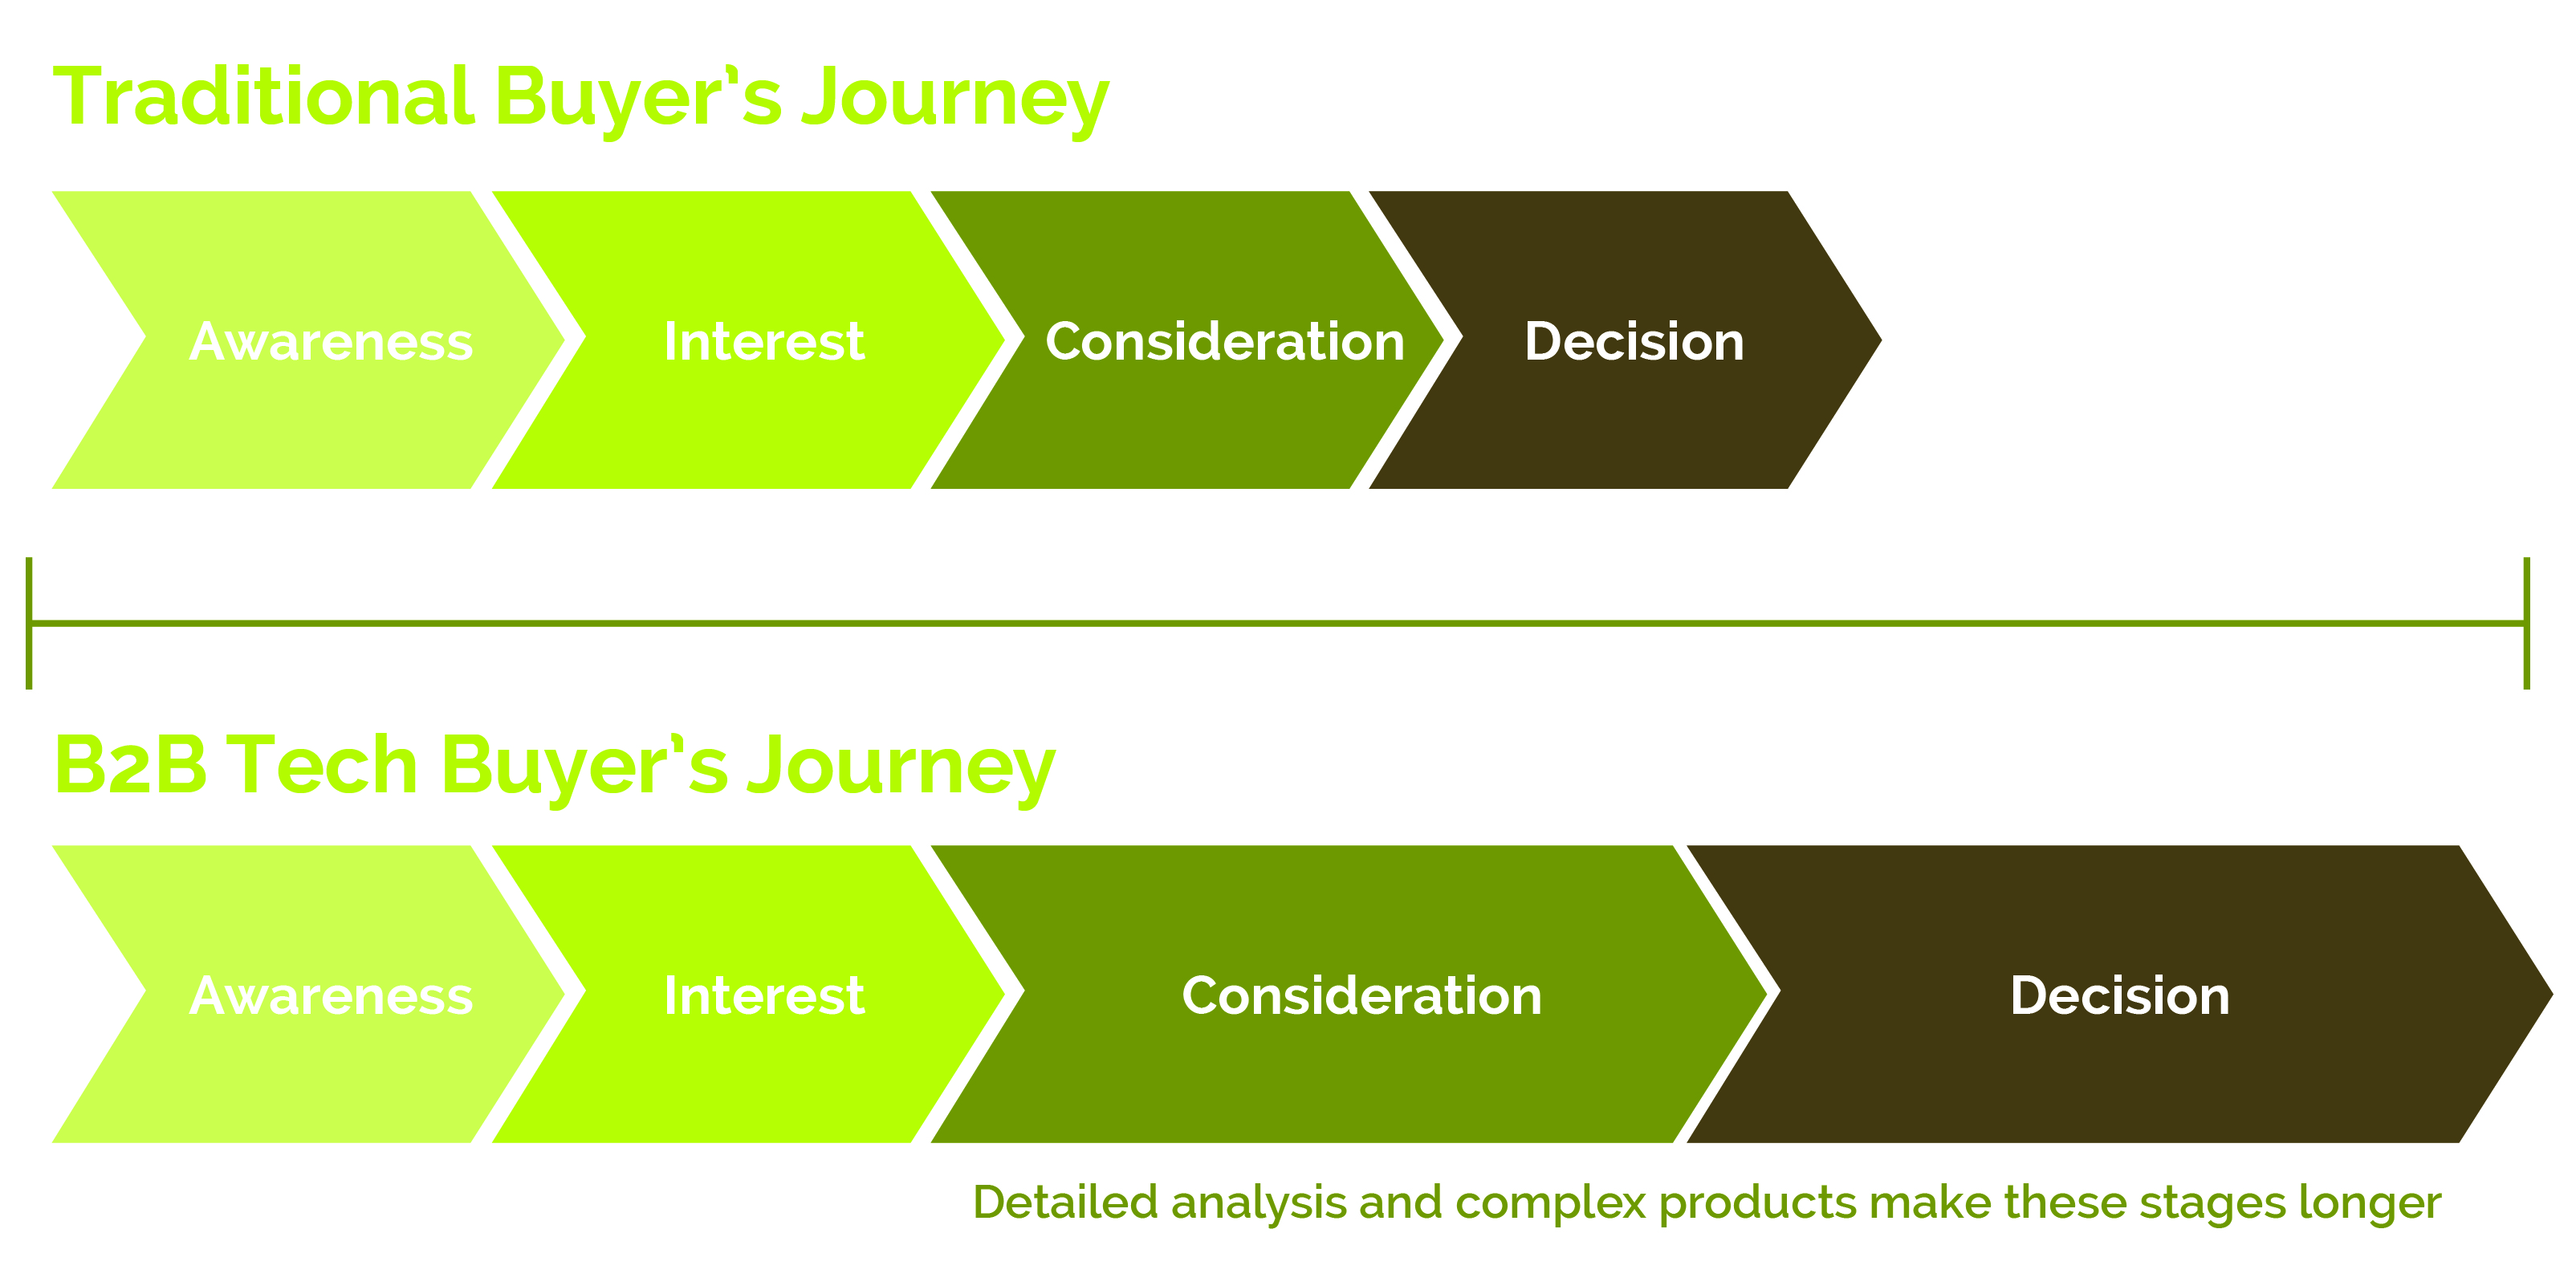 Traditional Buyers Journey vs. B2B Tech Buyers Journey